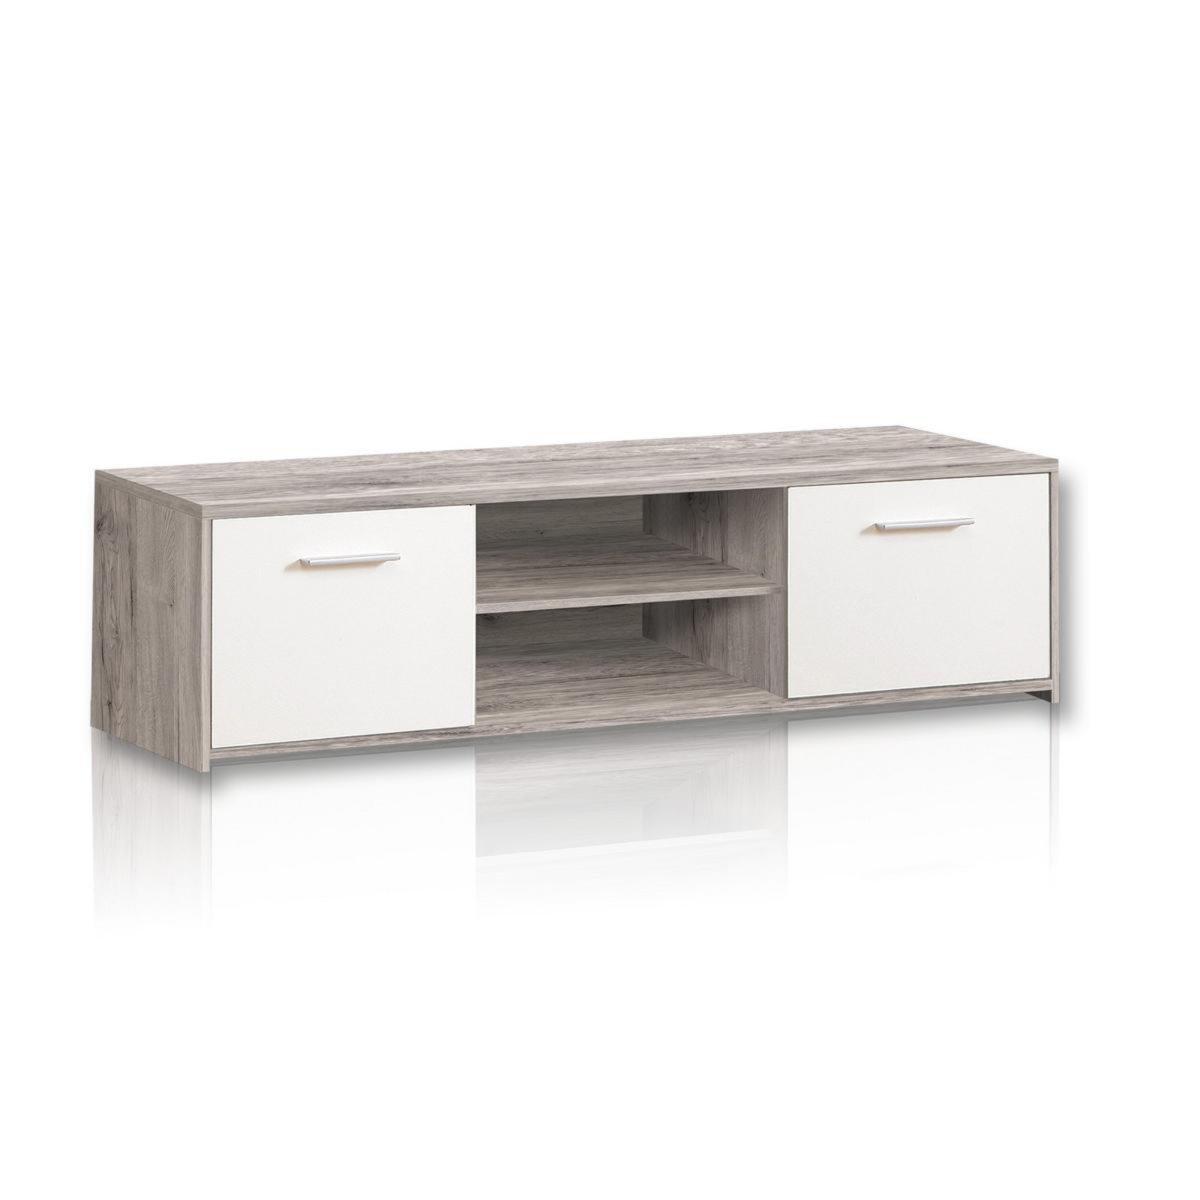 tv unterschrank quadro sandeiche wei tv lowboards tv b nke tv hifi m bel m bel. Black Bedroom Furniture Sets. Home Design Ideas